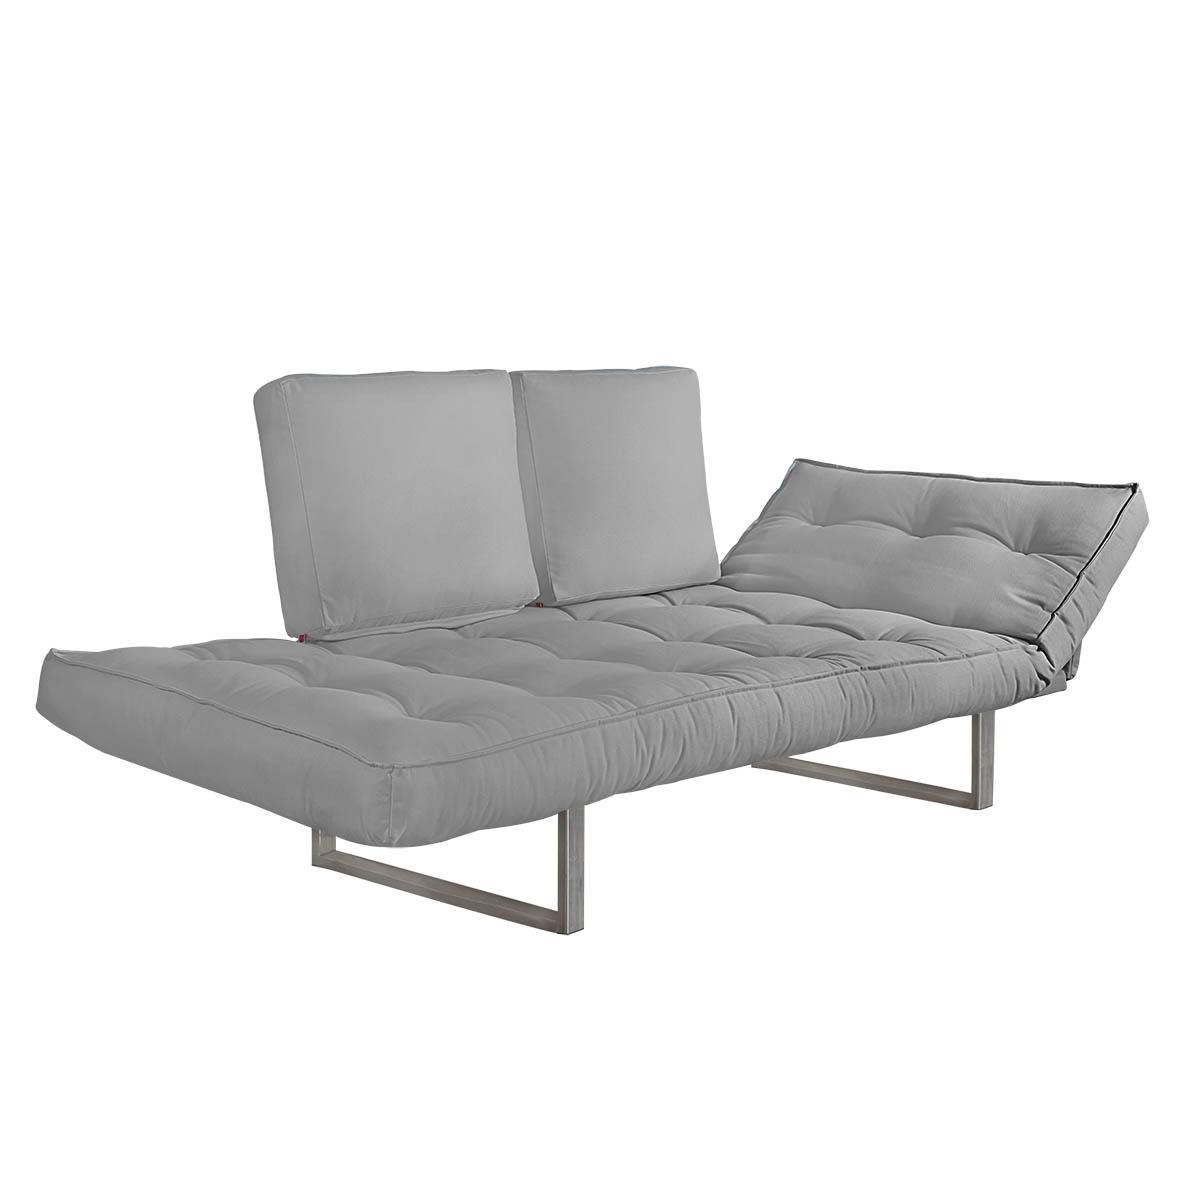 Sofa cama en ikea catalogo ikea sofas cama ikea exarby sofa bed thesofa sofa cama ikea modelo Ikea catalogo sofas cama